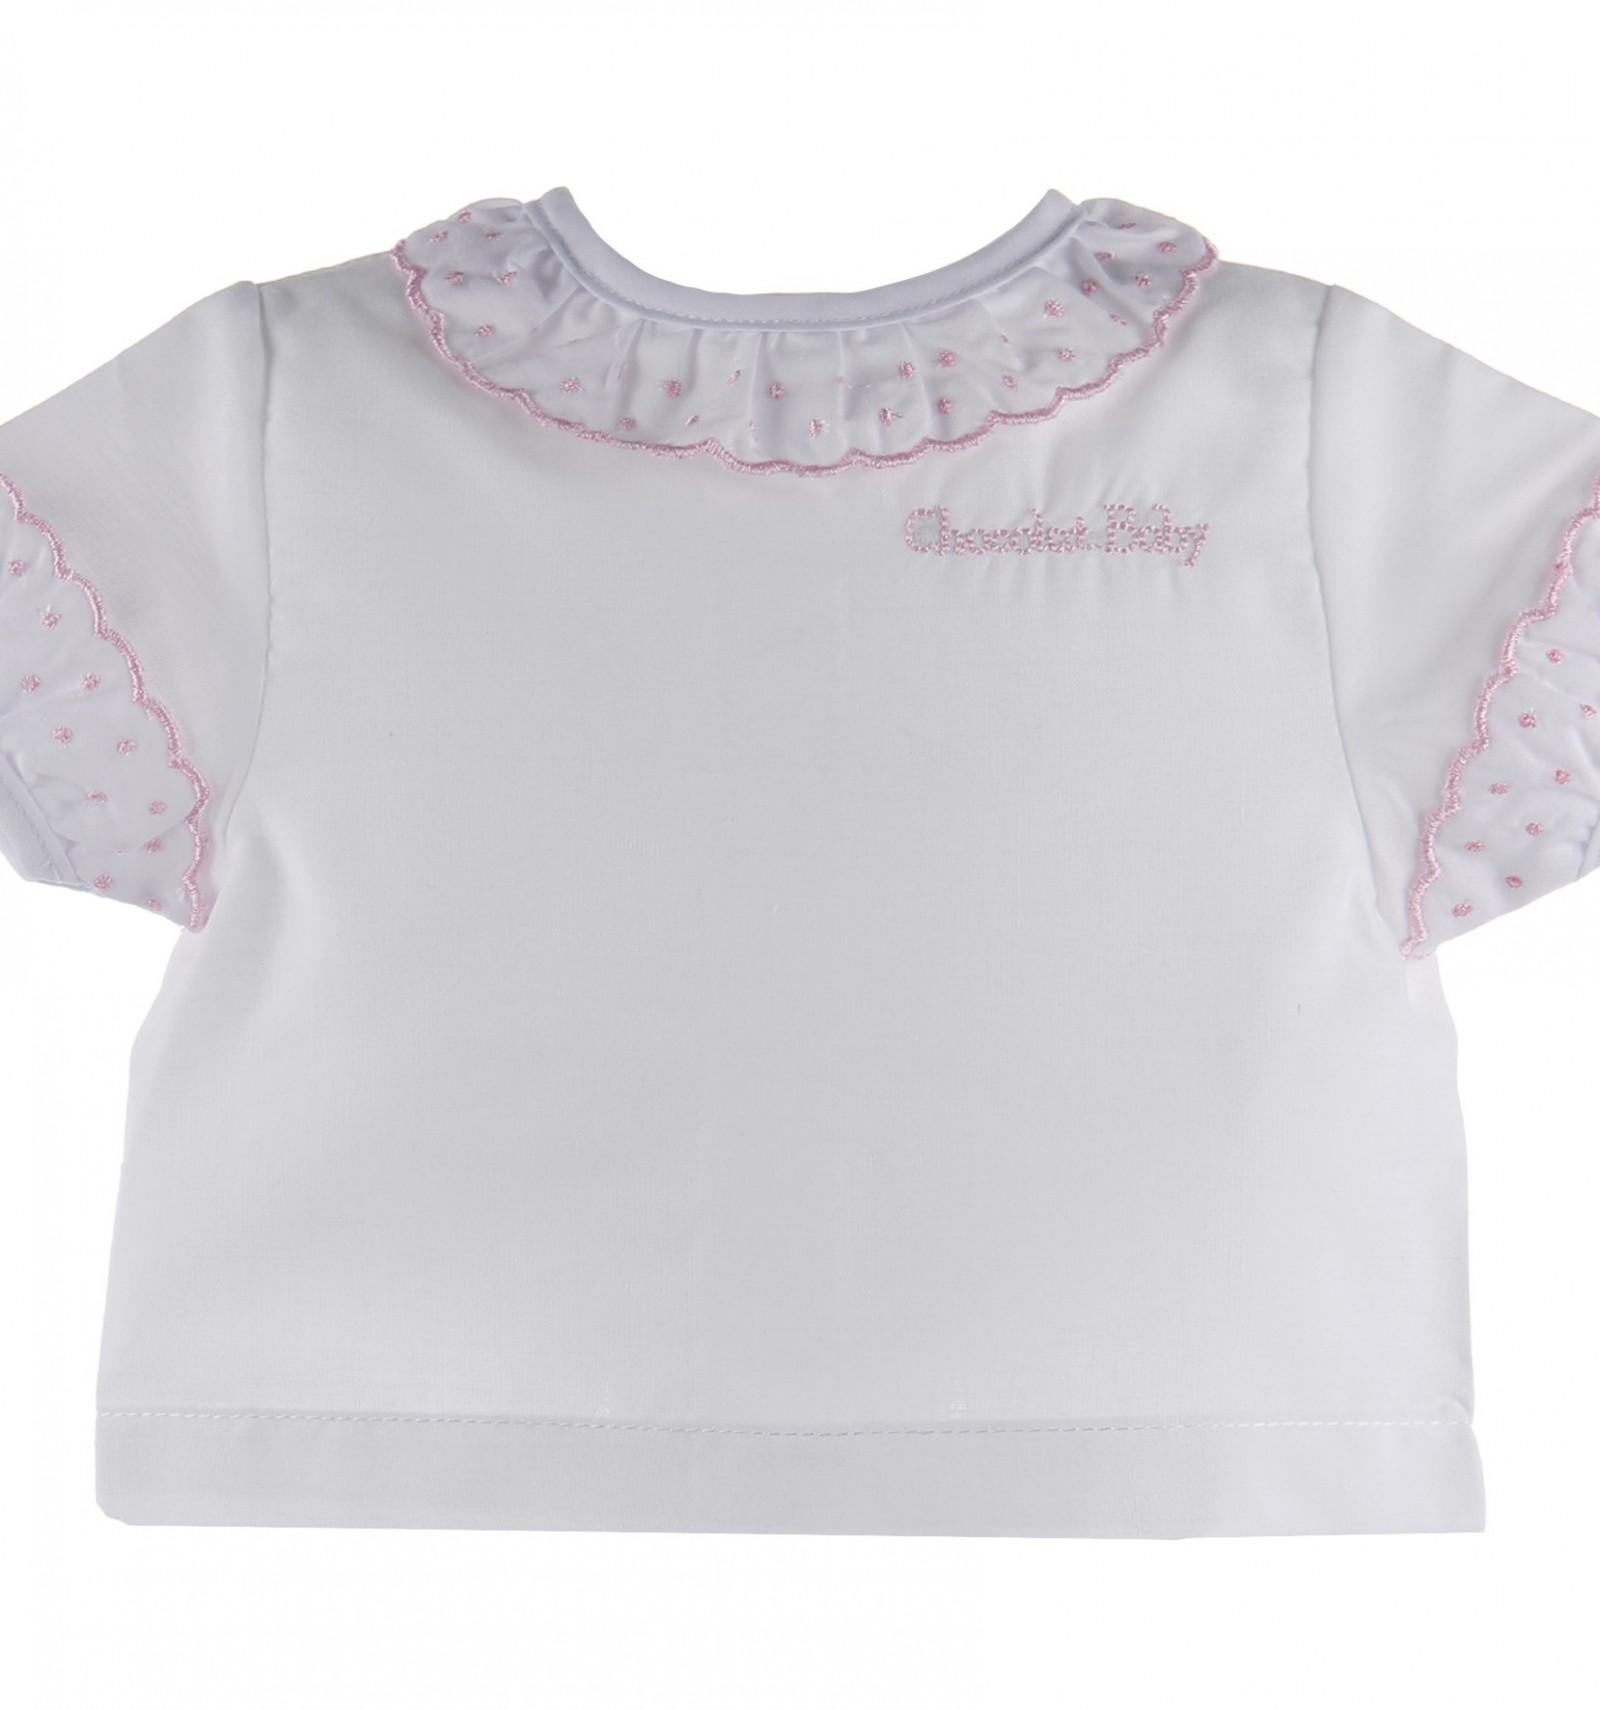 54cc18cf7 Camisa de batista de manga corta para bebés con volante de plumetis